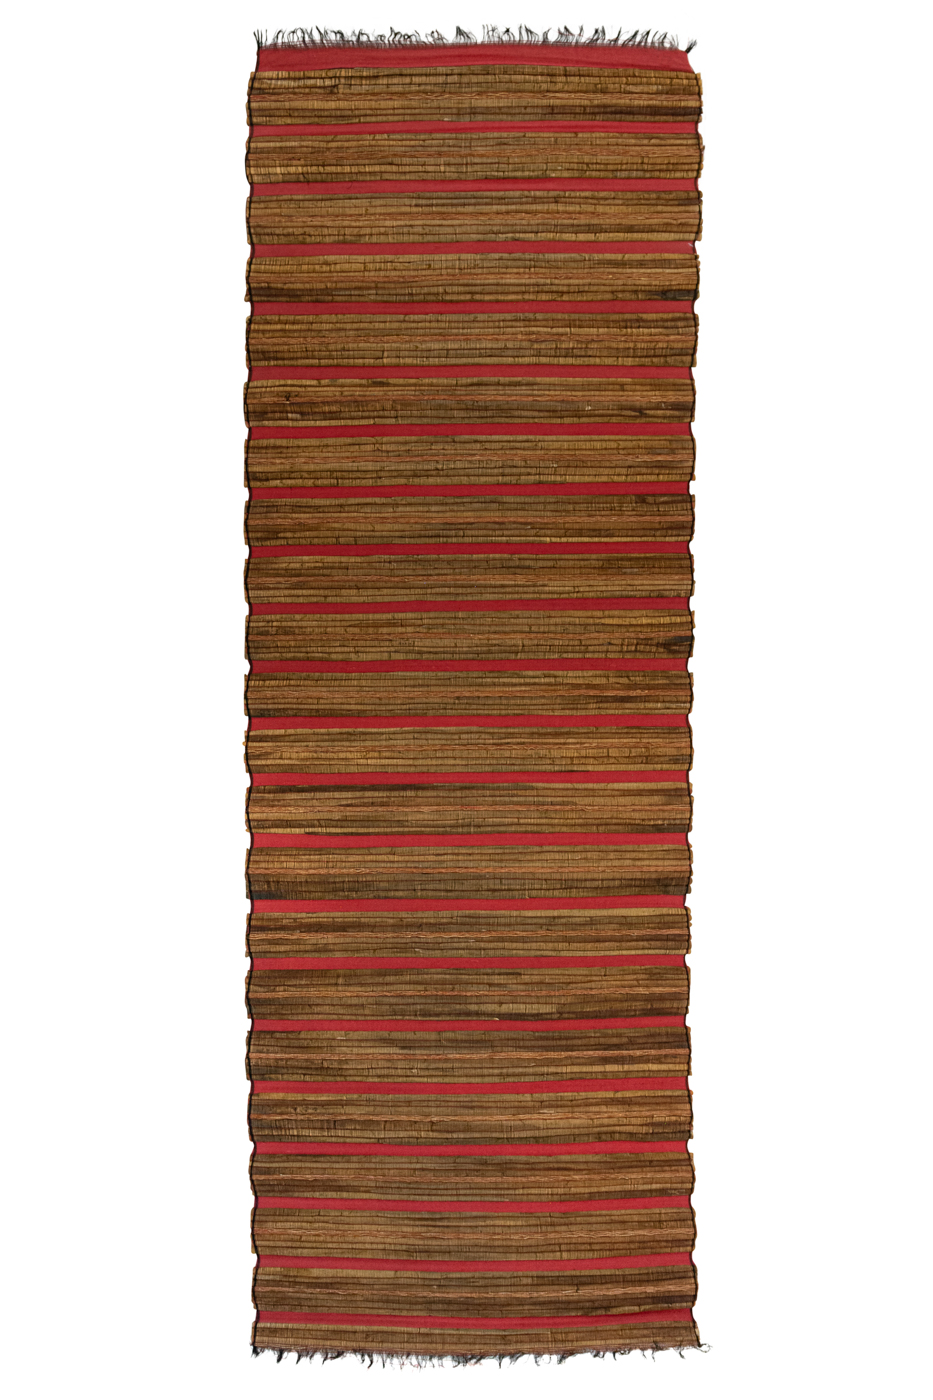 Esterilla en bamboo marrón-rojo